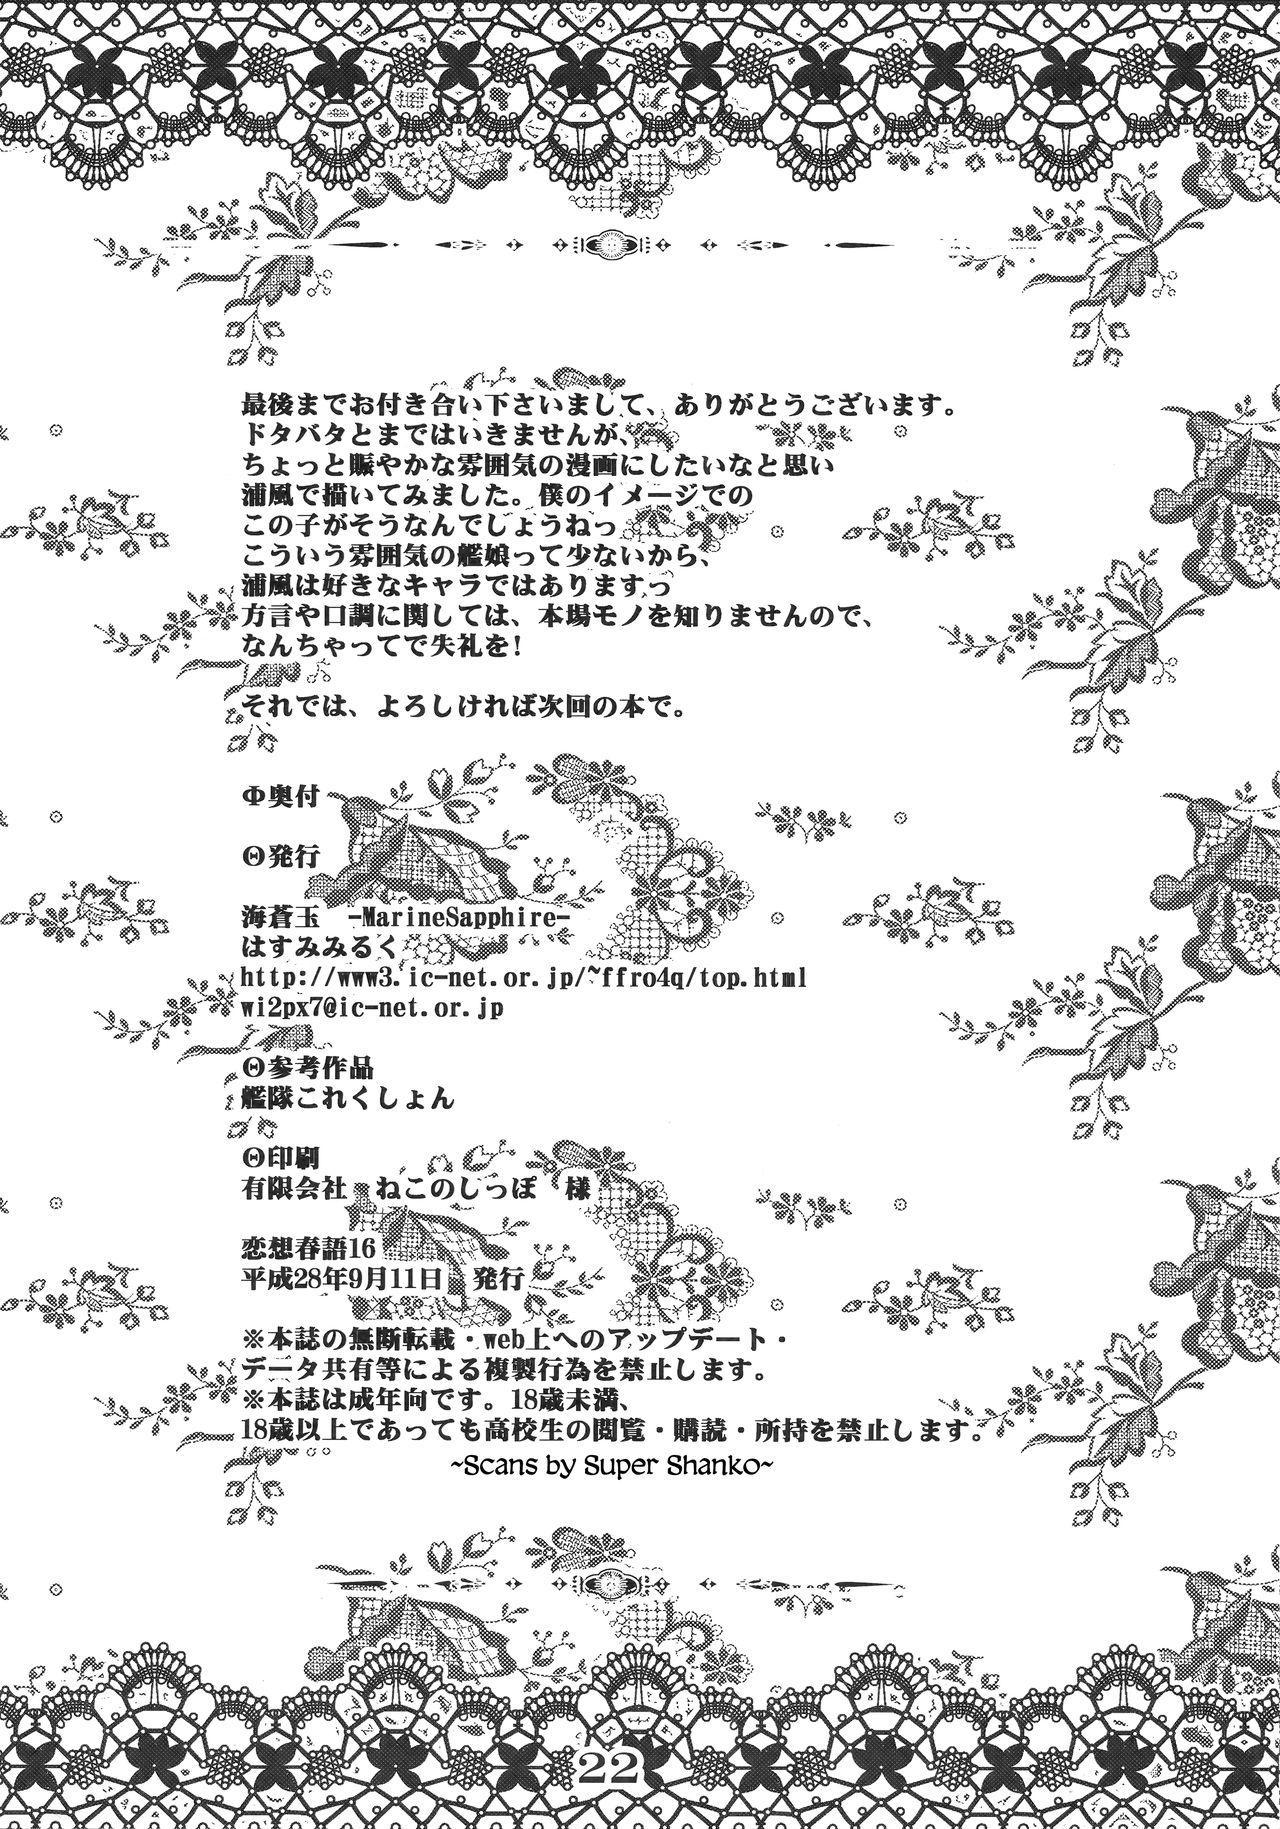 Rensou Harugatari 16 20